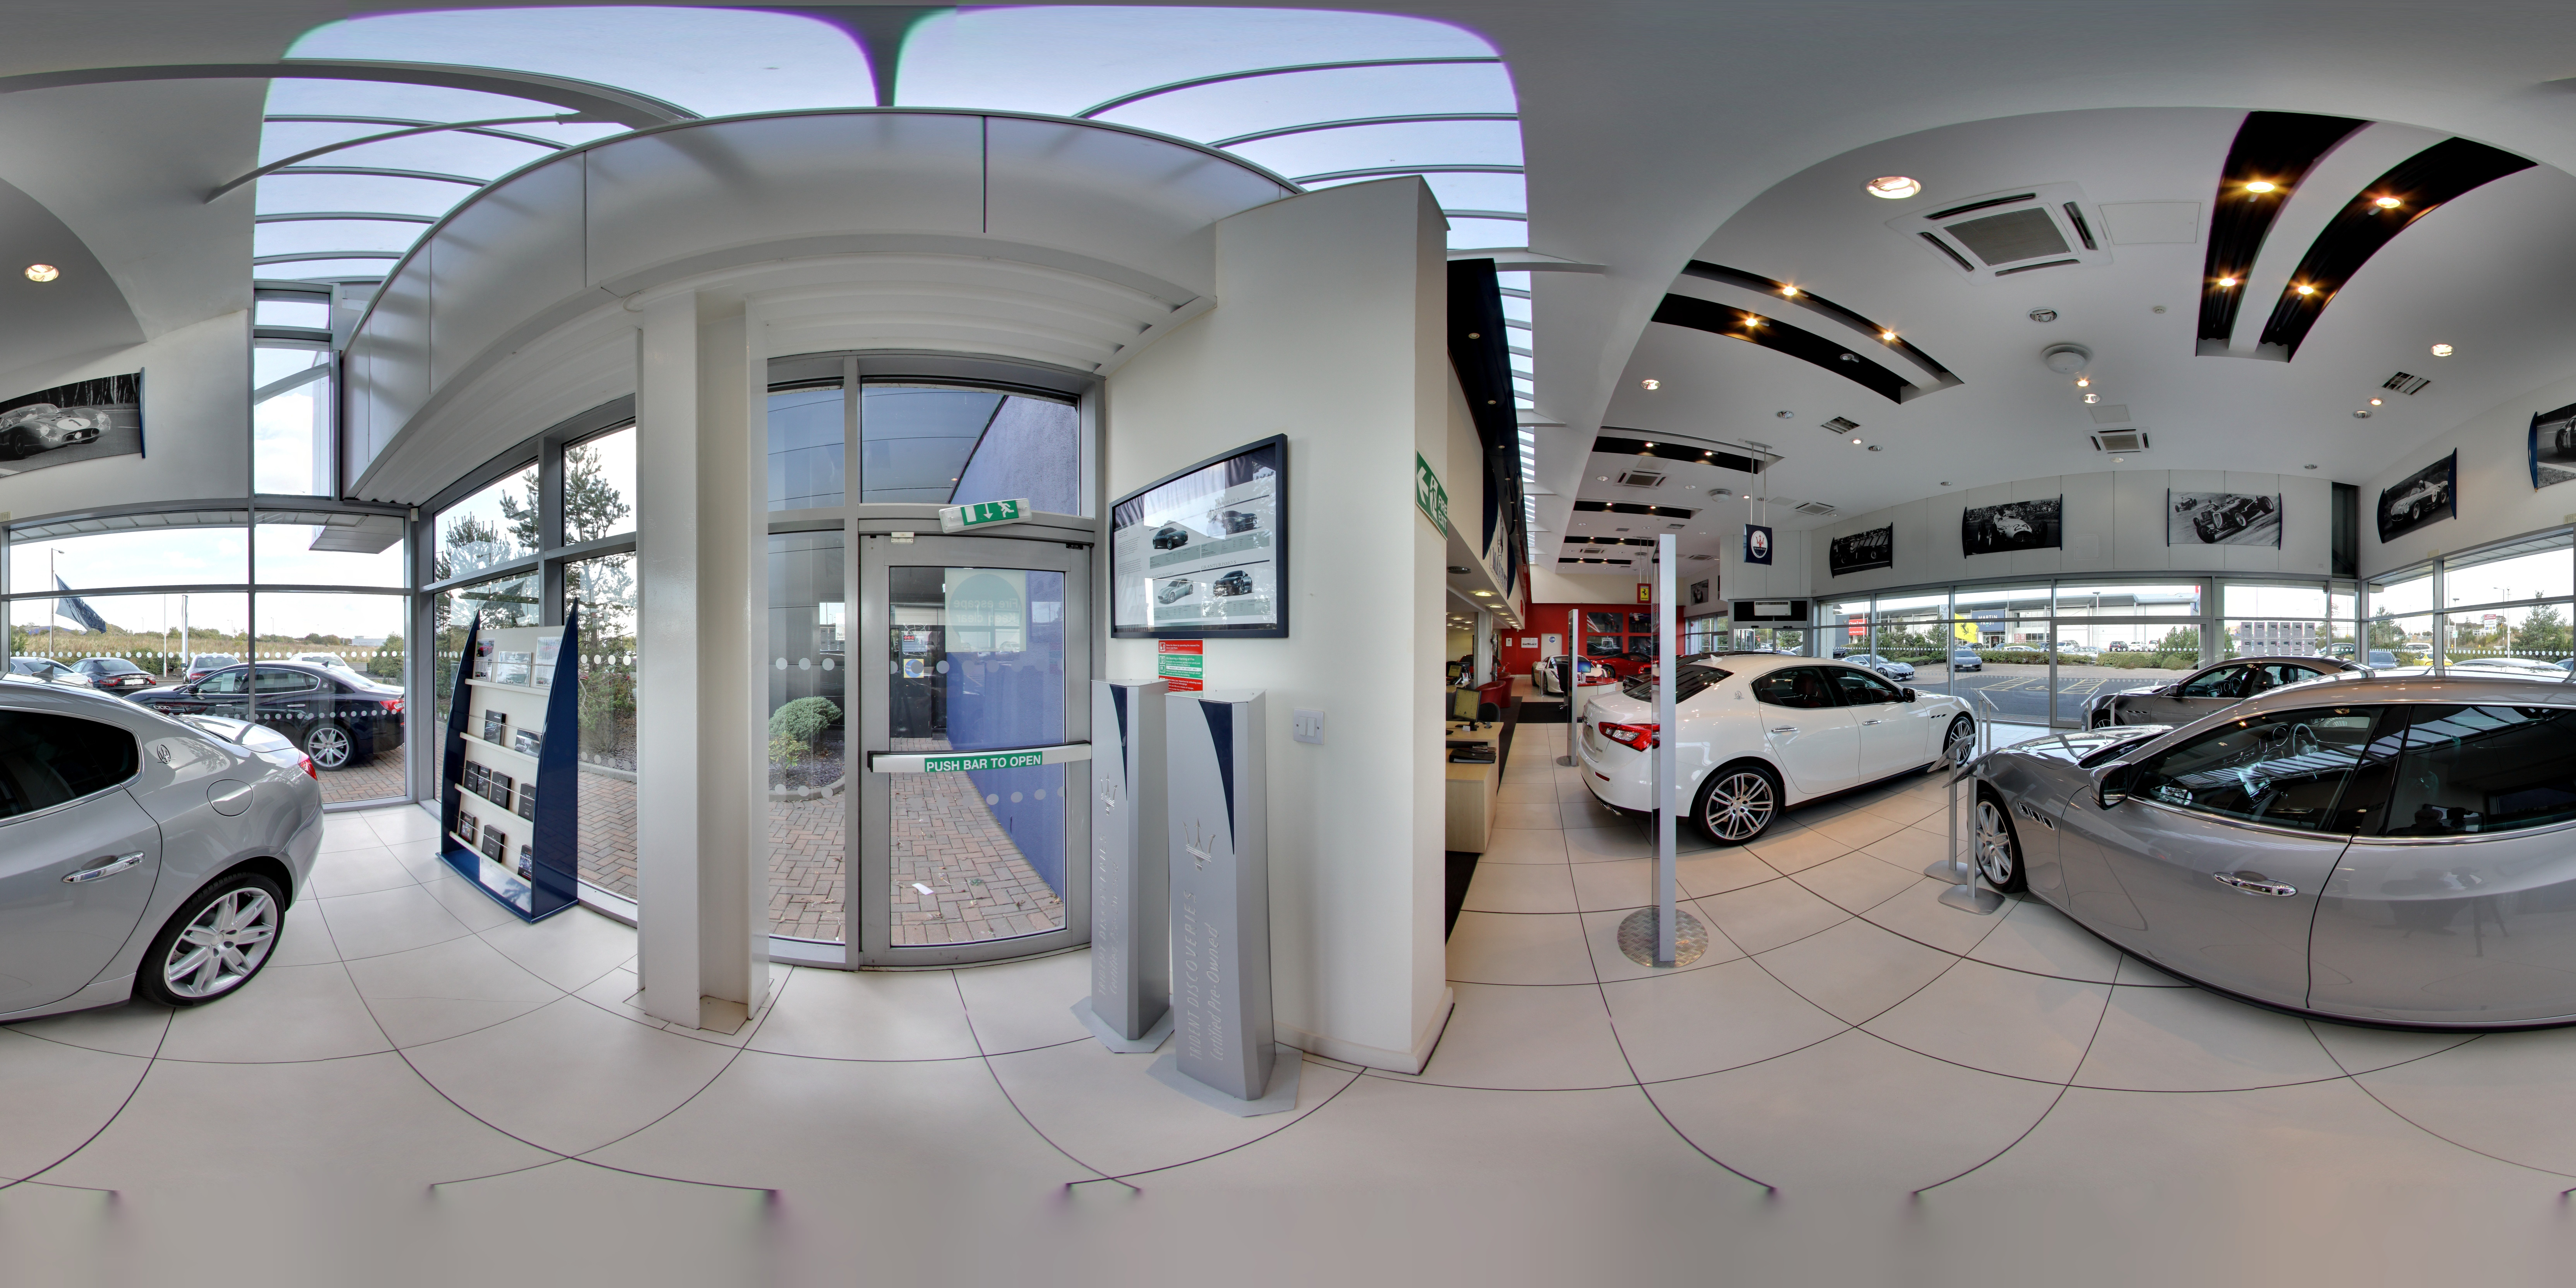 Graypaul Maserati Edinburgh - Midlothain, Midlothian EH15 3HR - 01314 755000 | ShowMeLocal.com